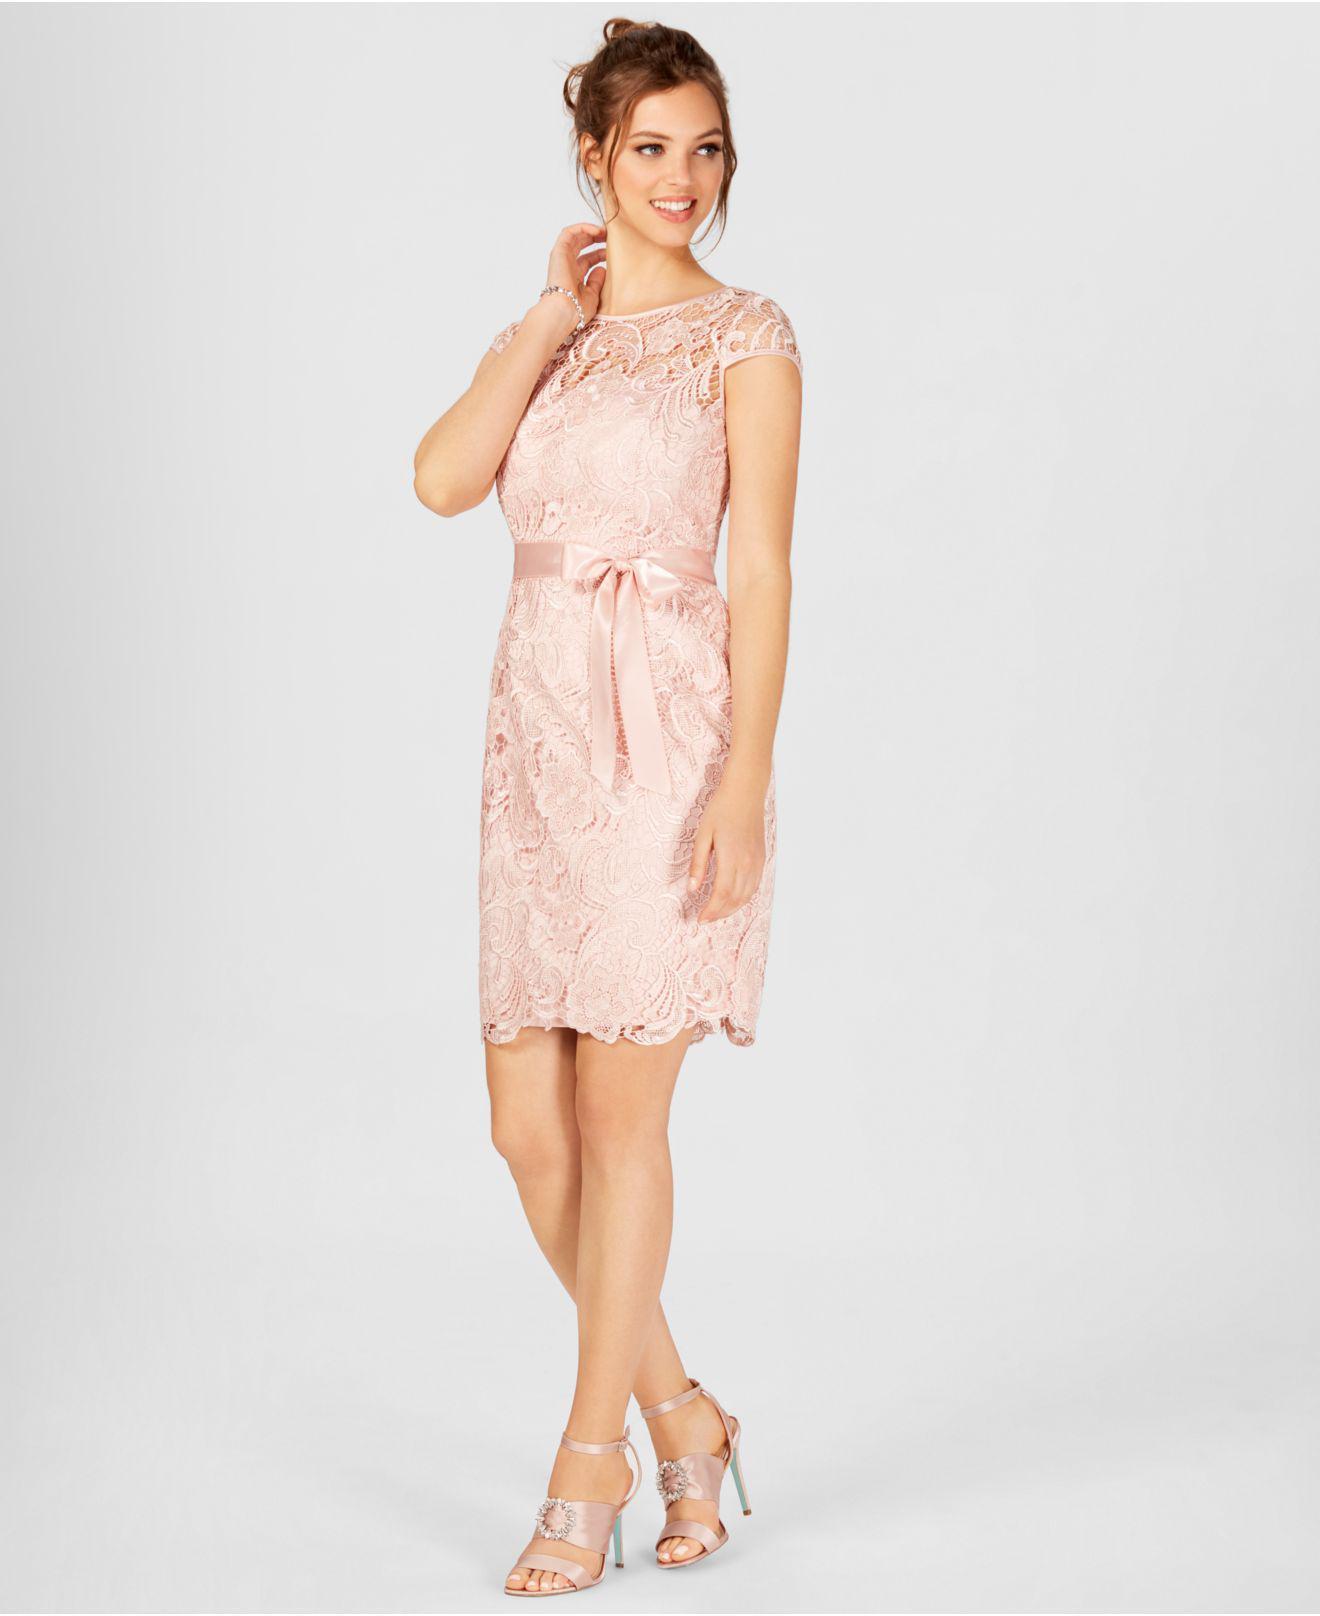 43abb7f2 Adrianna Papell - Pink Cap-sleeve Illusion Lace Sheath - Lyst. View  fullscreen